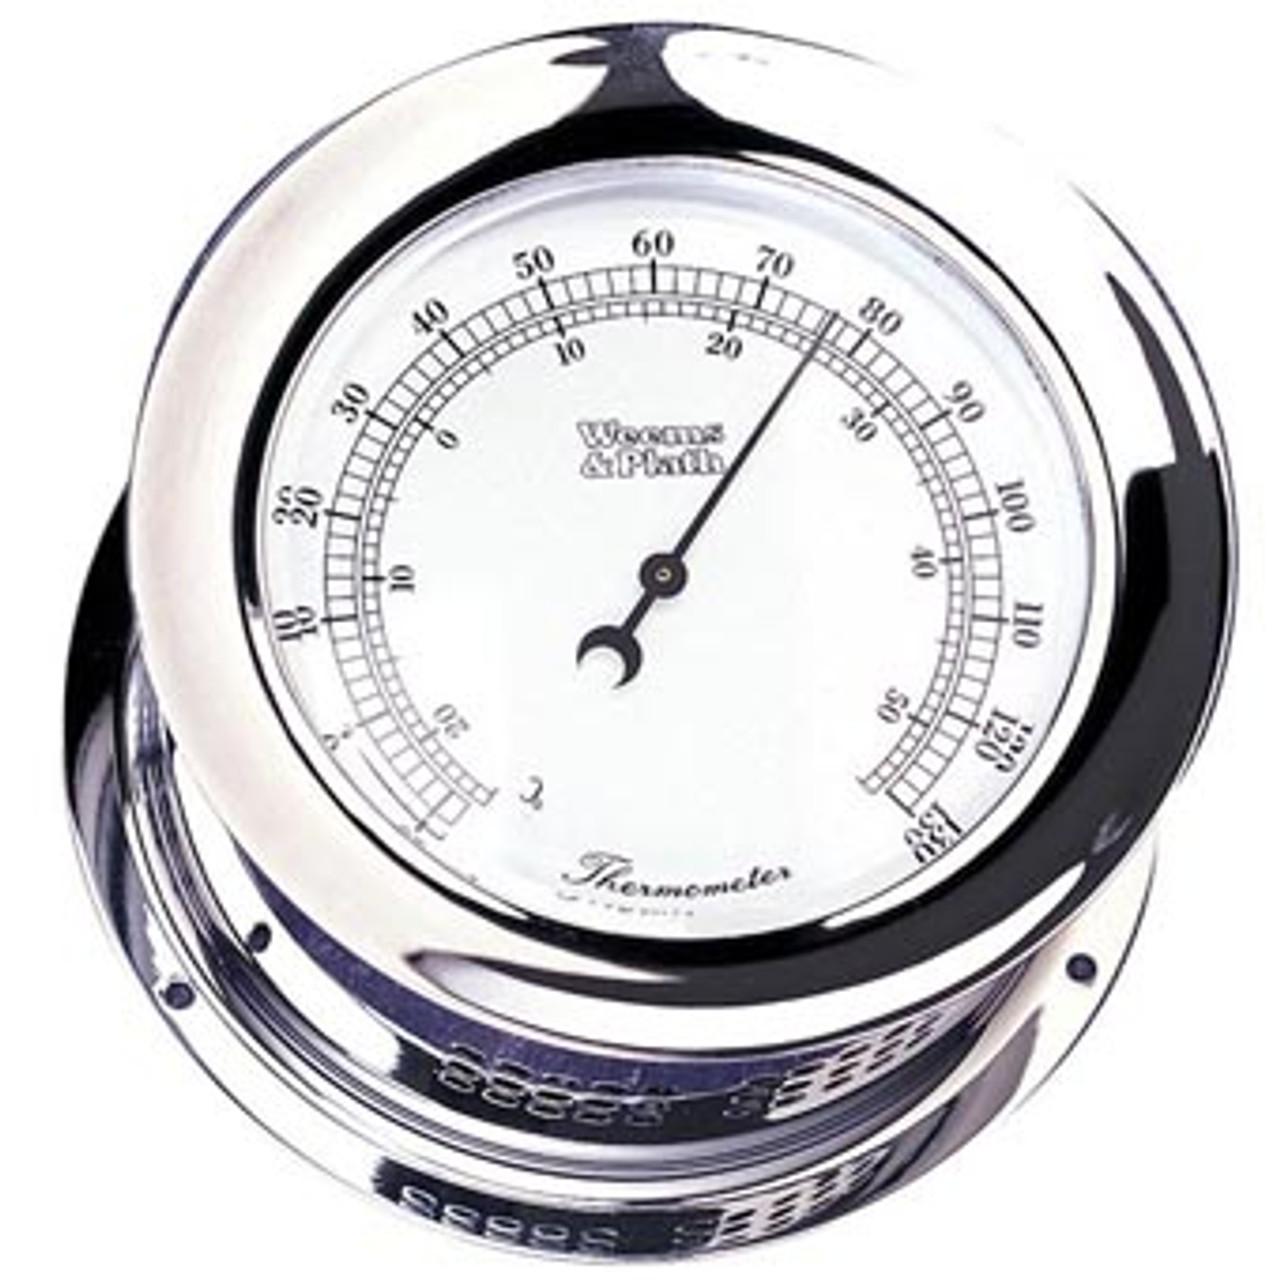 Chrome Plated Atlantis Thermometer (221200)